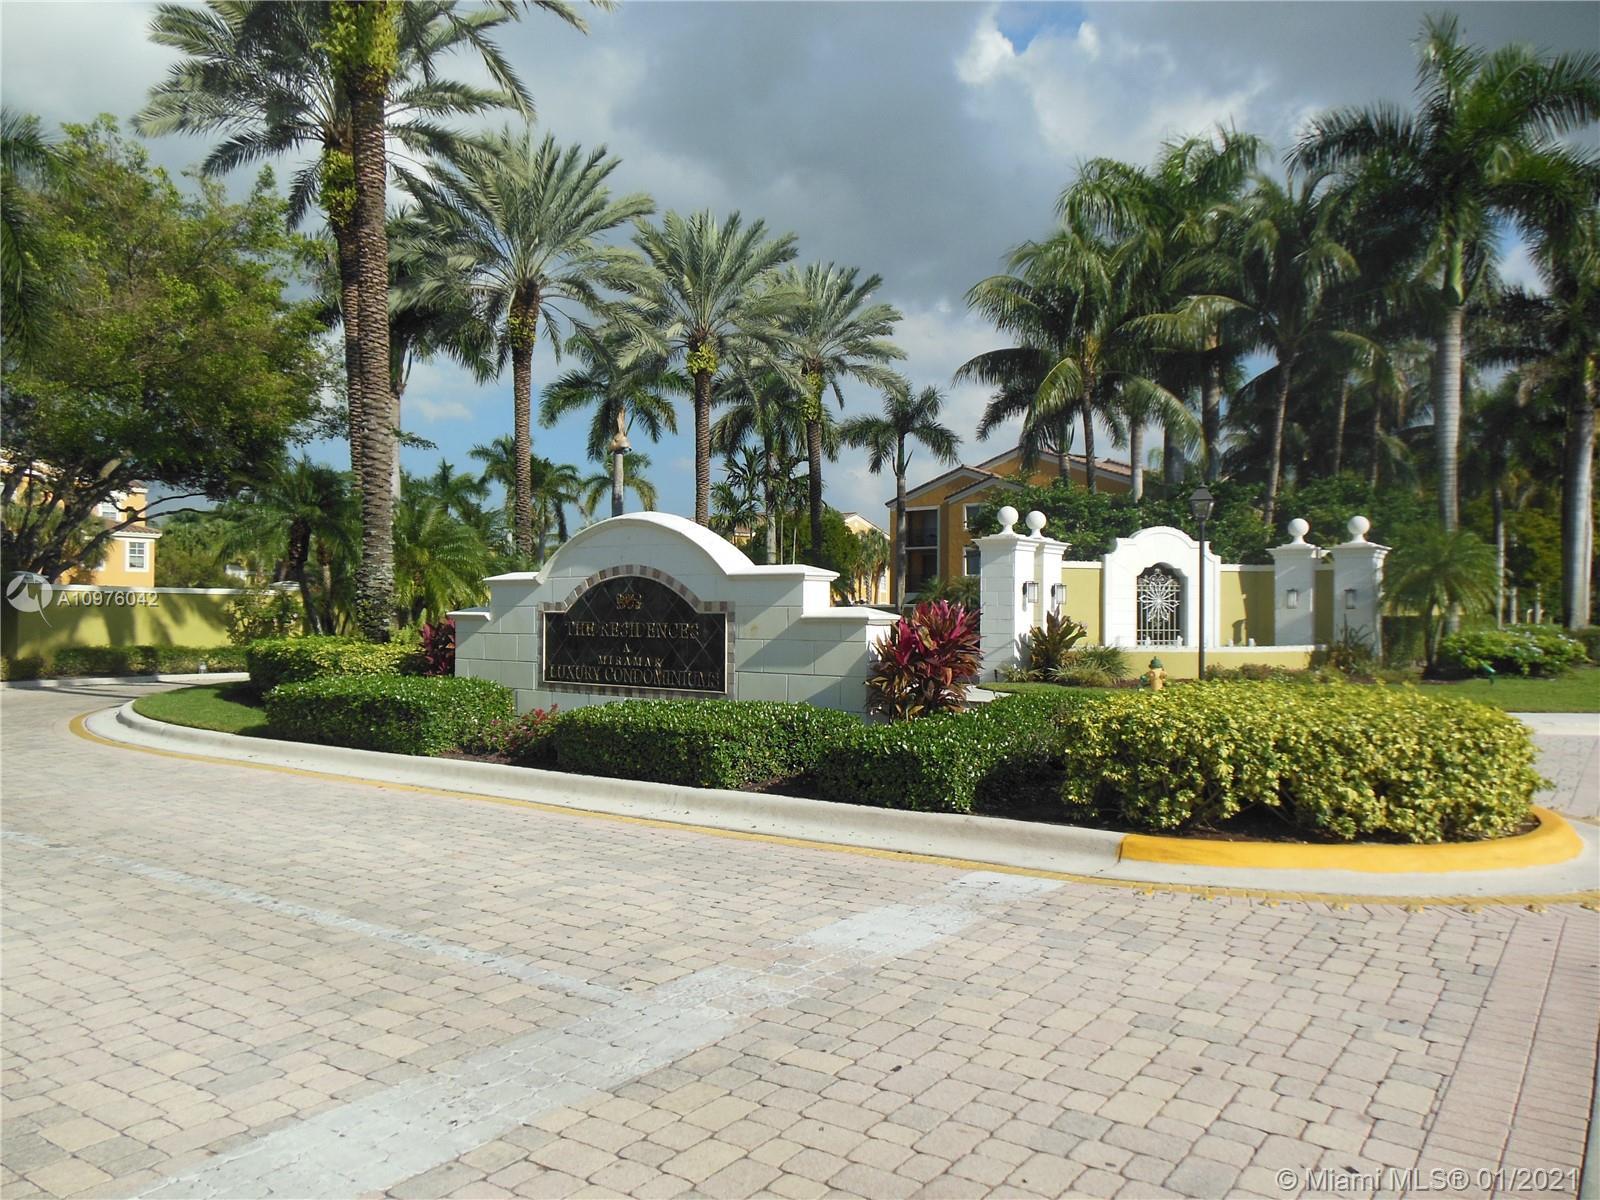 2301 W Preserve Way Unit 301, Miramar, Florida 33025